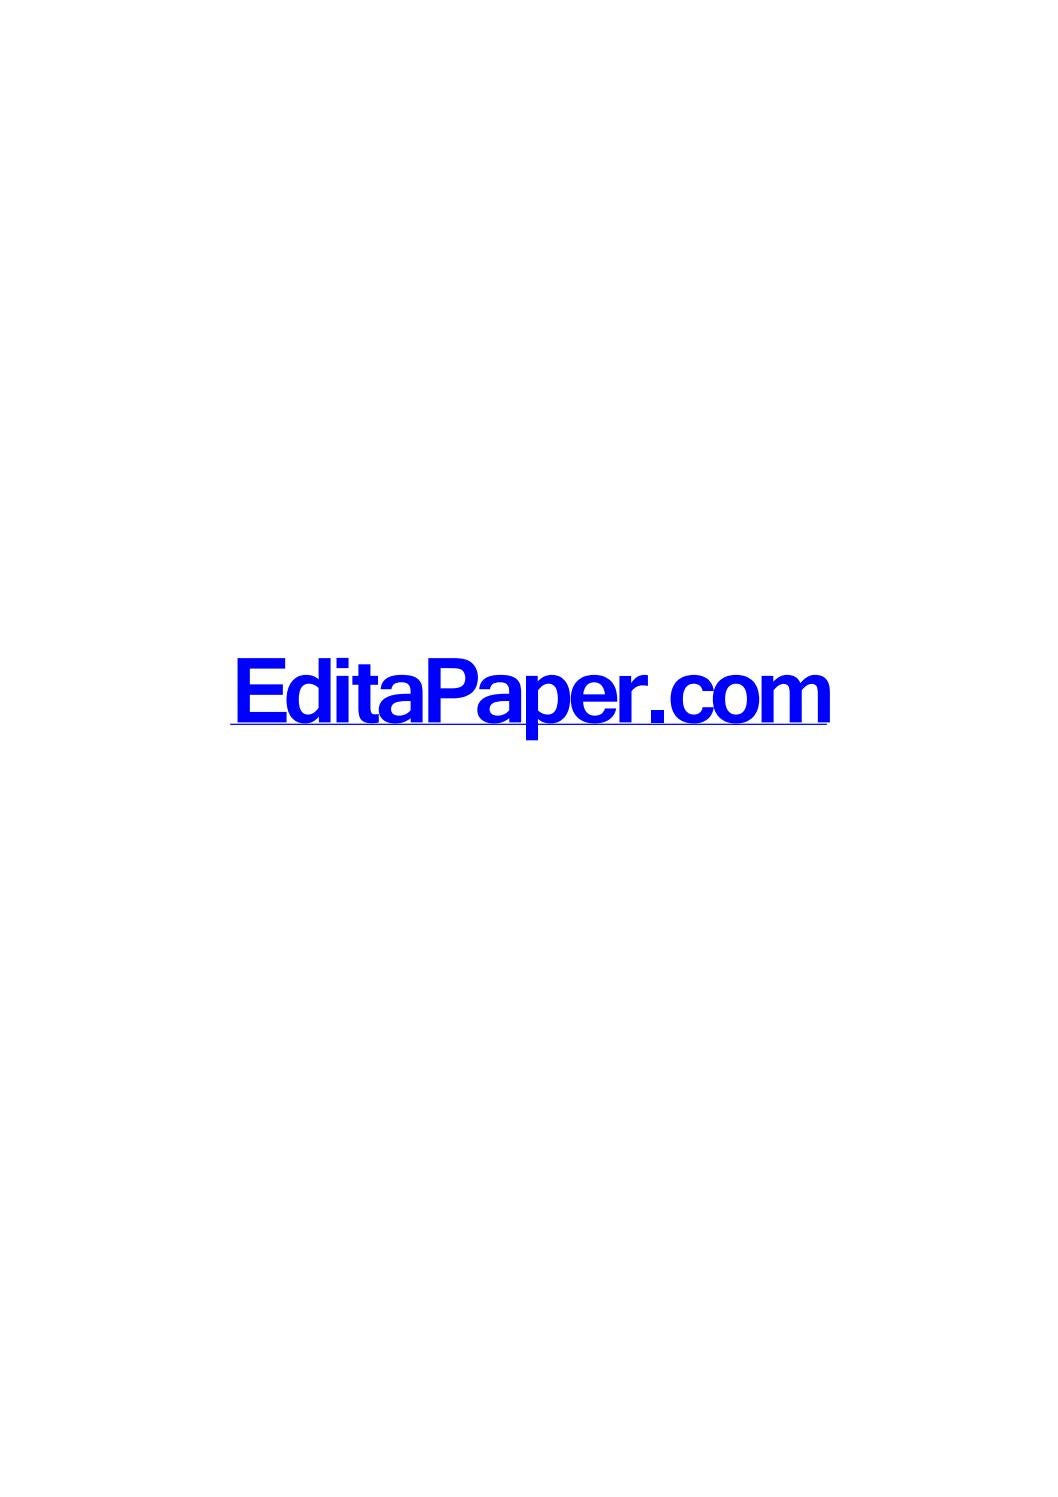 Internet service austin providers list